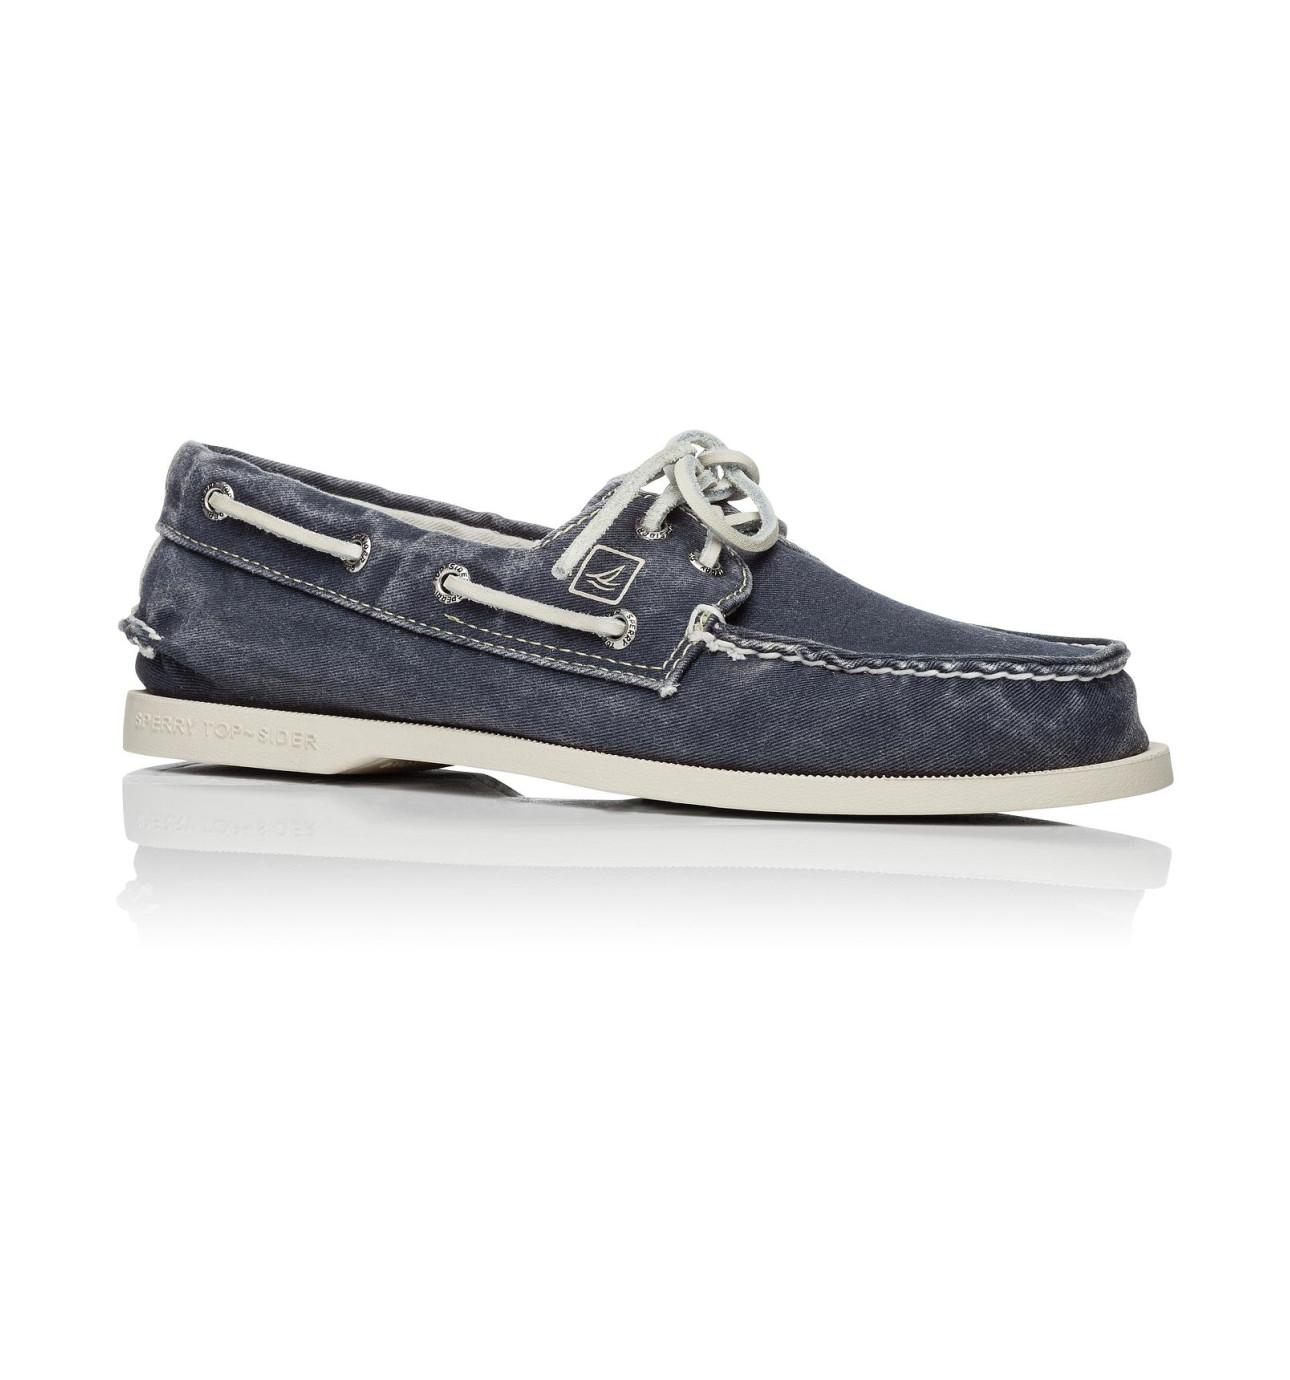 Men's Boat Shoes | Shop Designer Men Shoes | David Jones Online